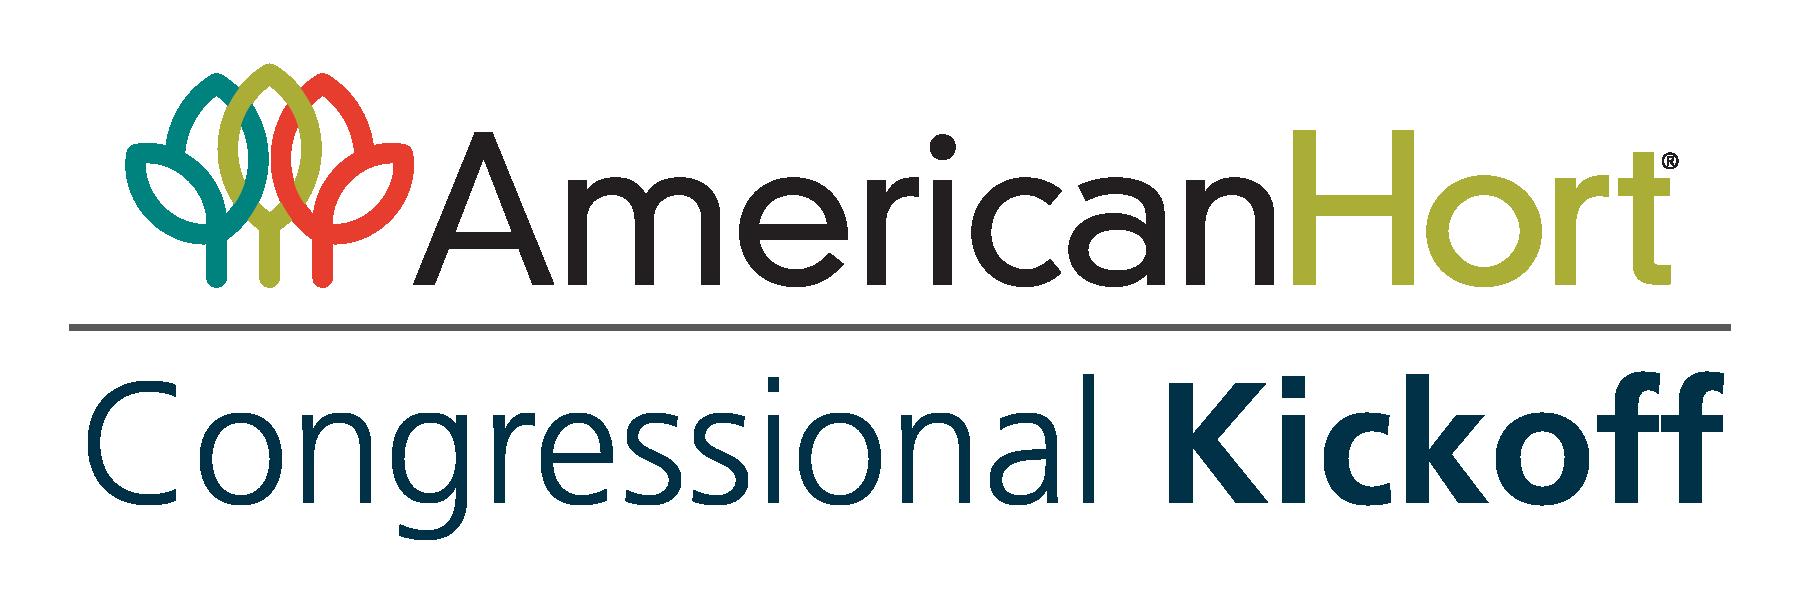 AmericanHort Congressional Kickoff